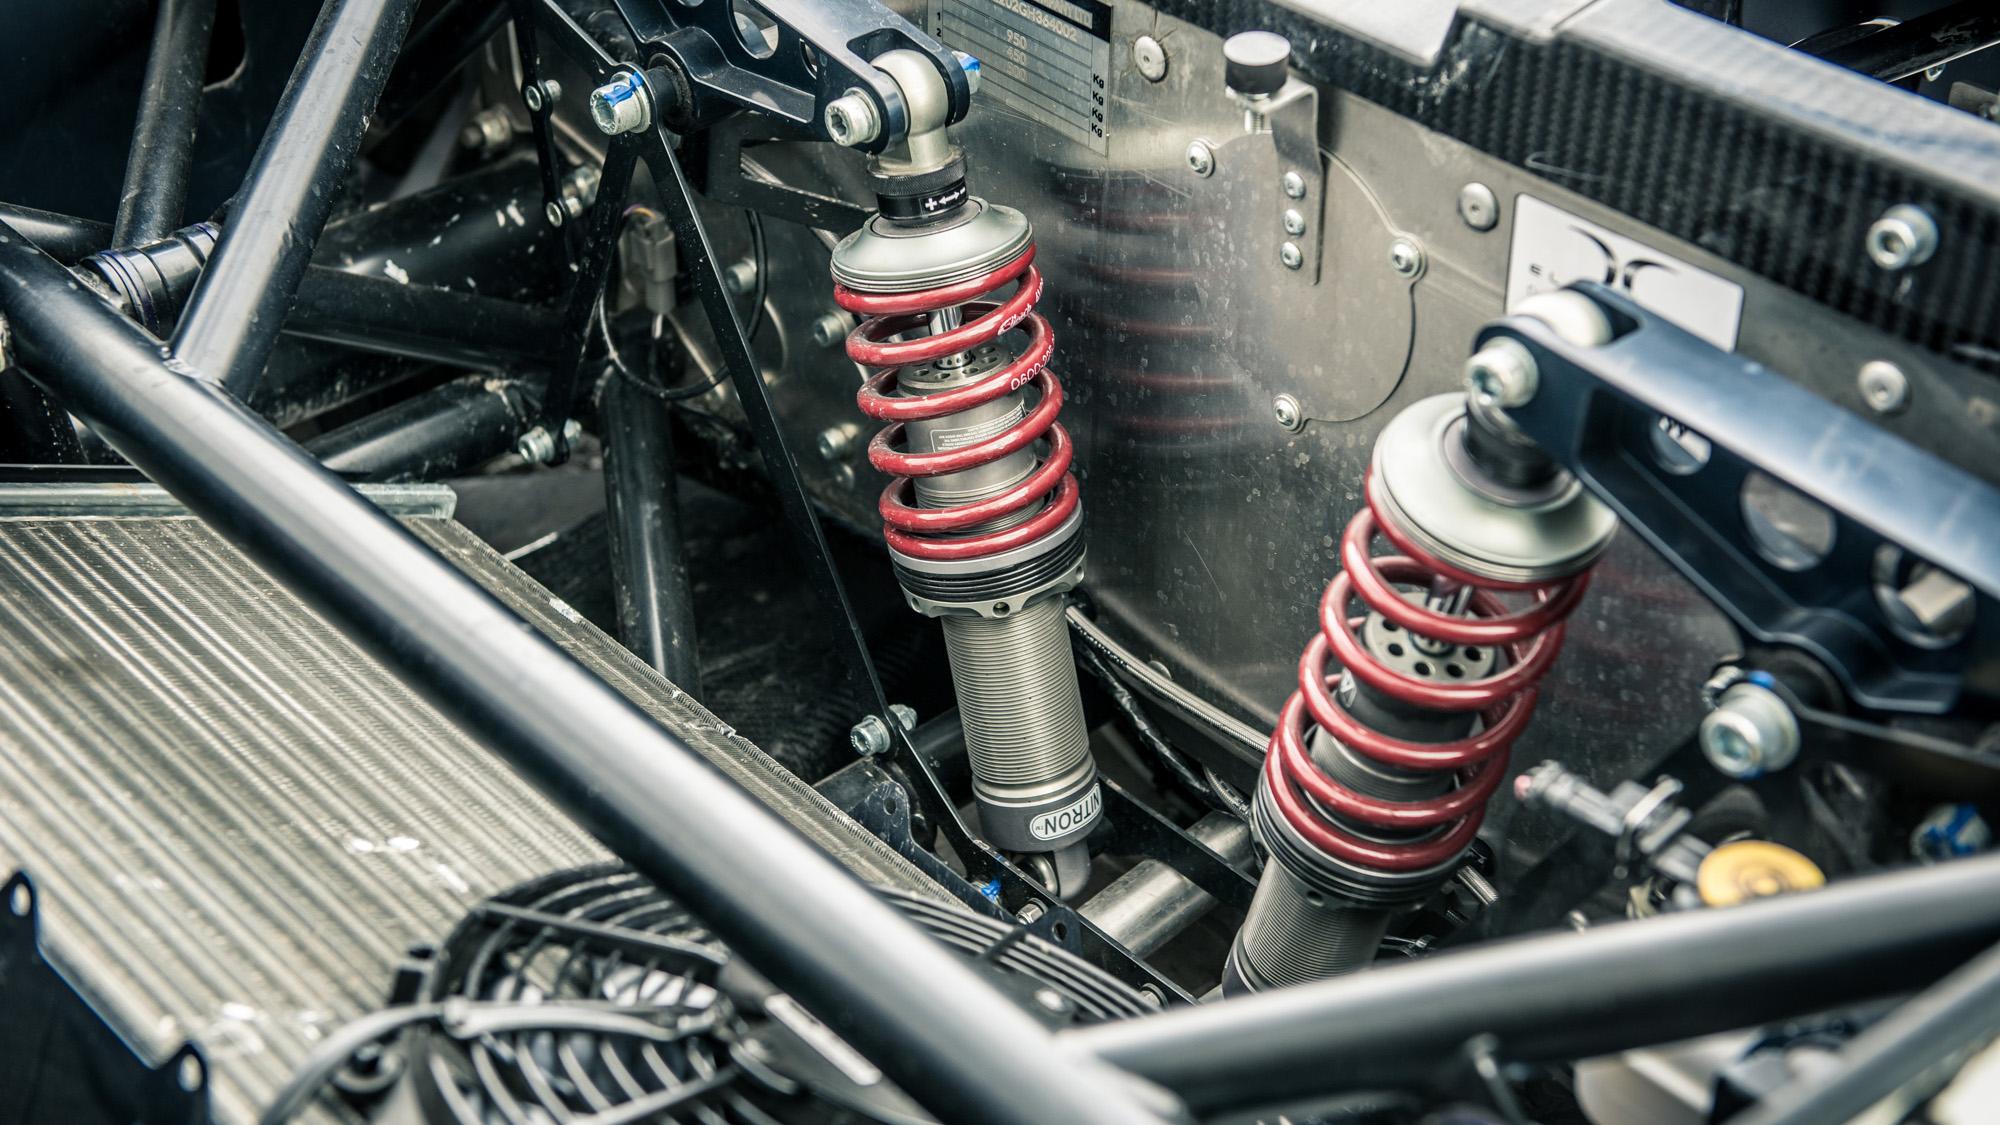 Elemental RP1 suspension